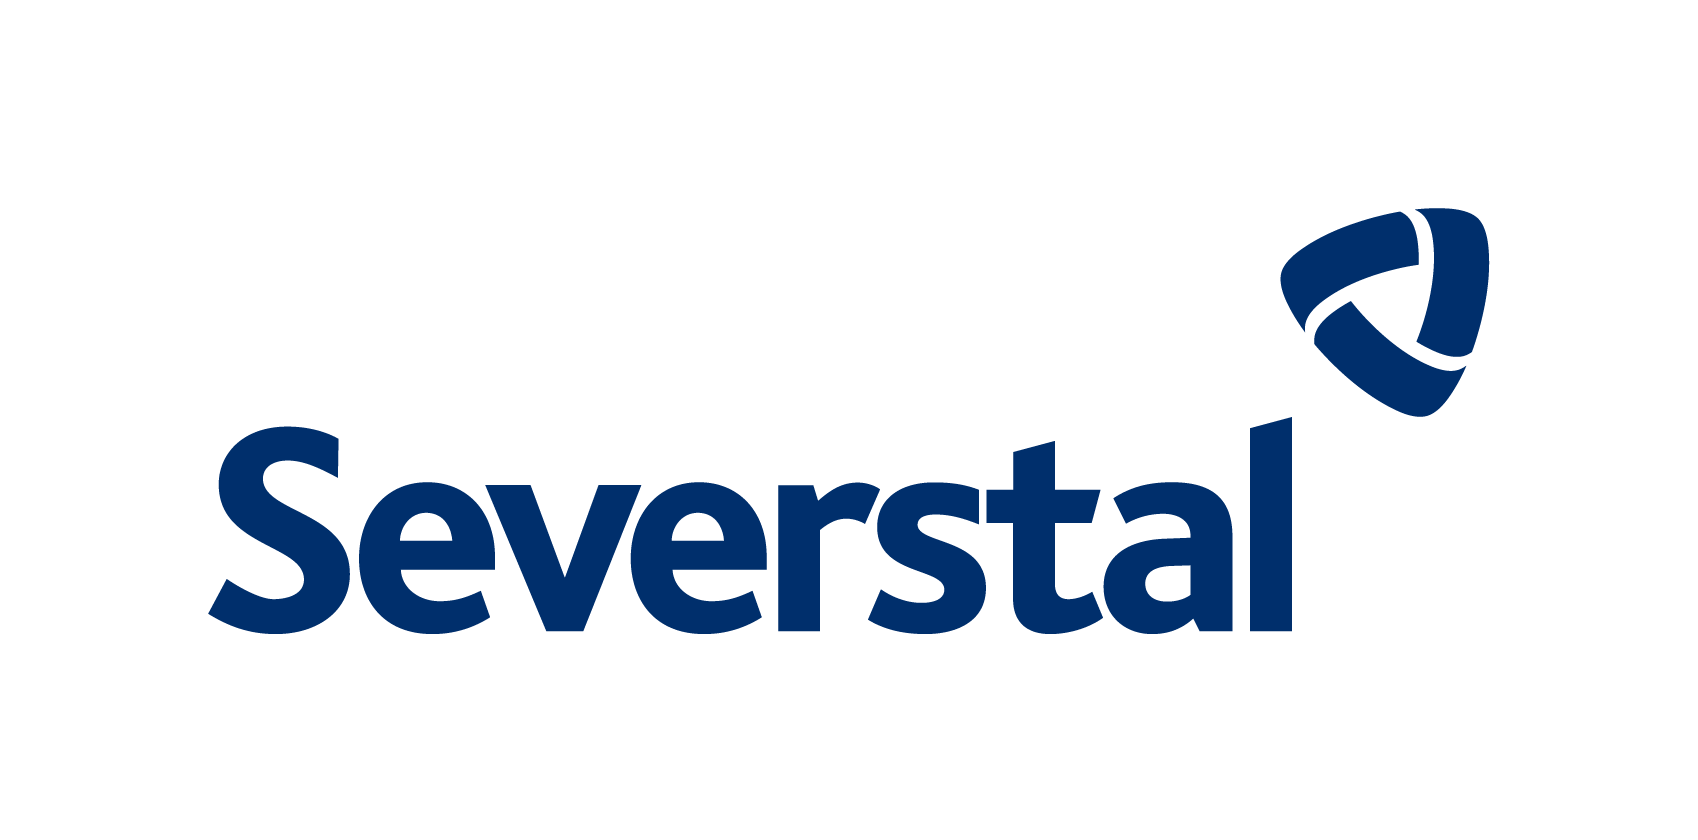 PUBLIC JOINT STOCK COMPANY SEVERSTAL Logo